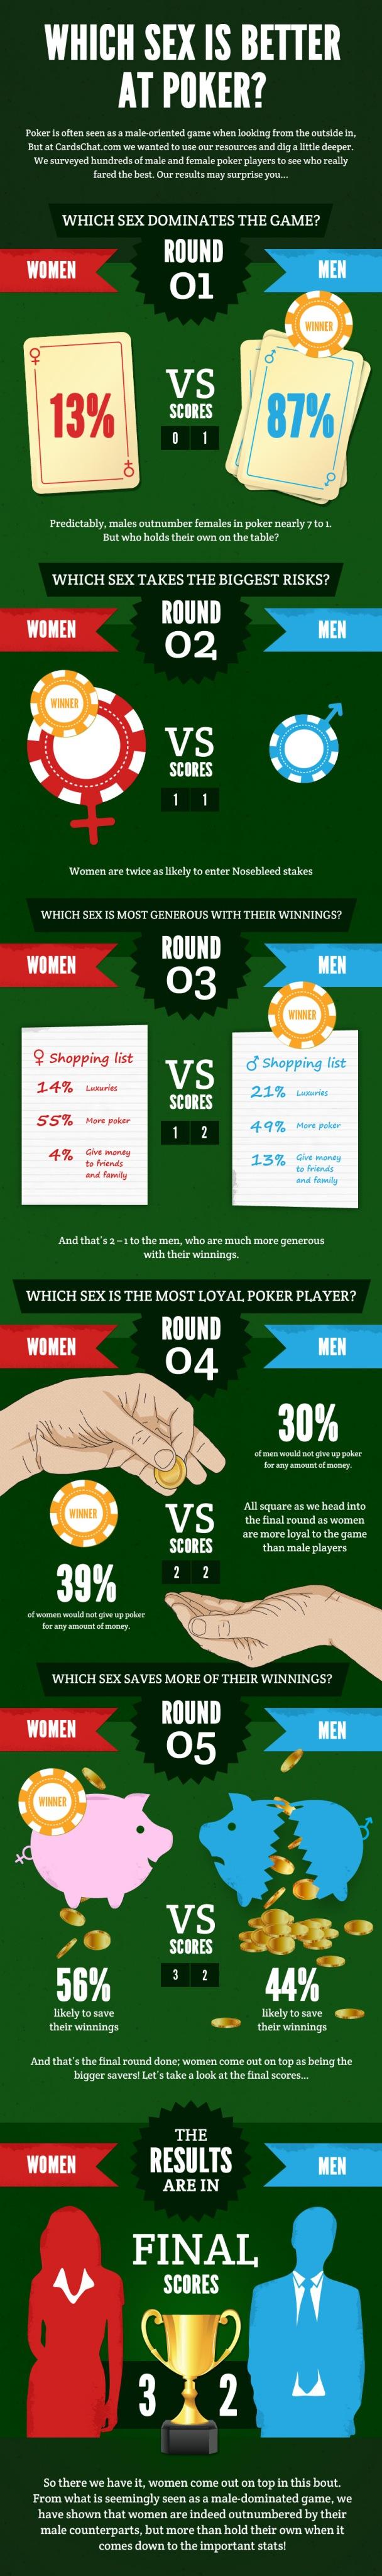 Battle of the Sexes - Canadian (Womens) Online Gambling